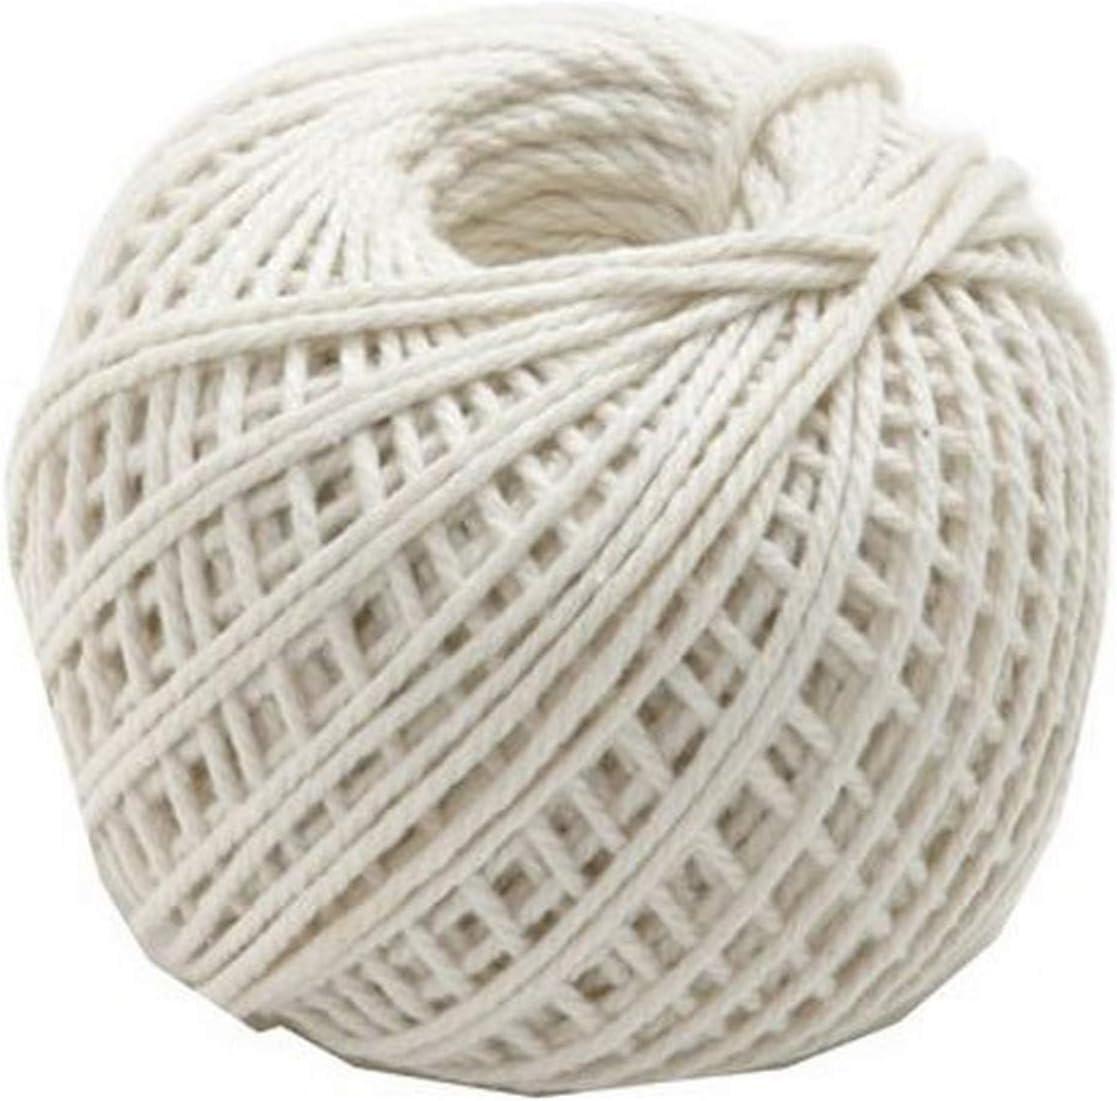 Norpro Max 59% OFF Cotton Twine White 73 yd. Denver Mall 220'